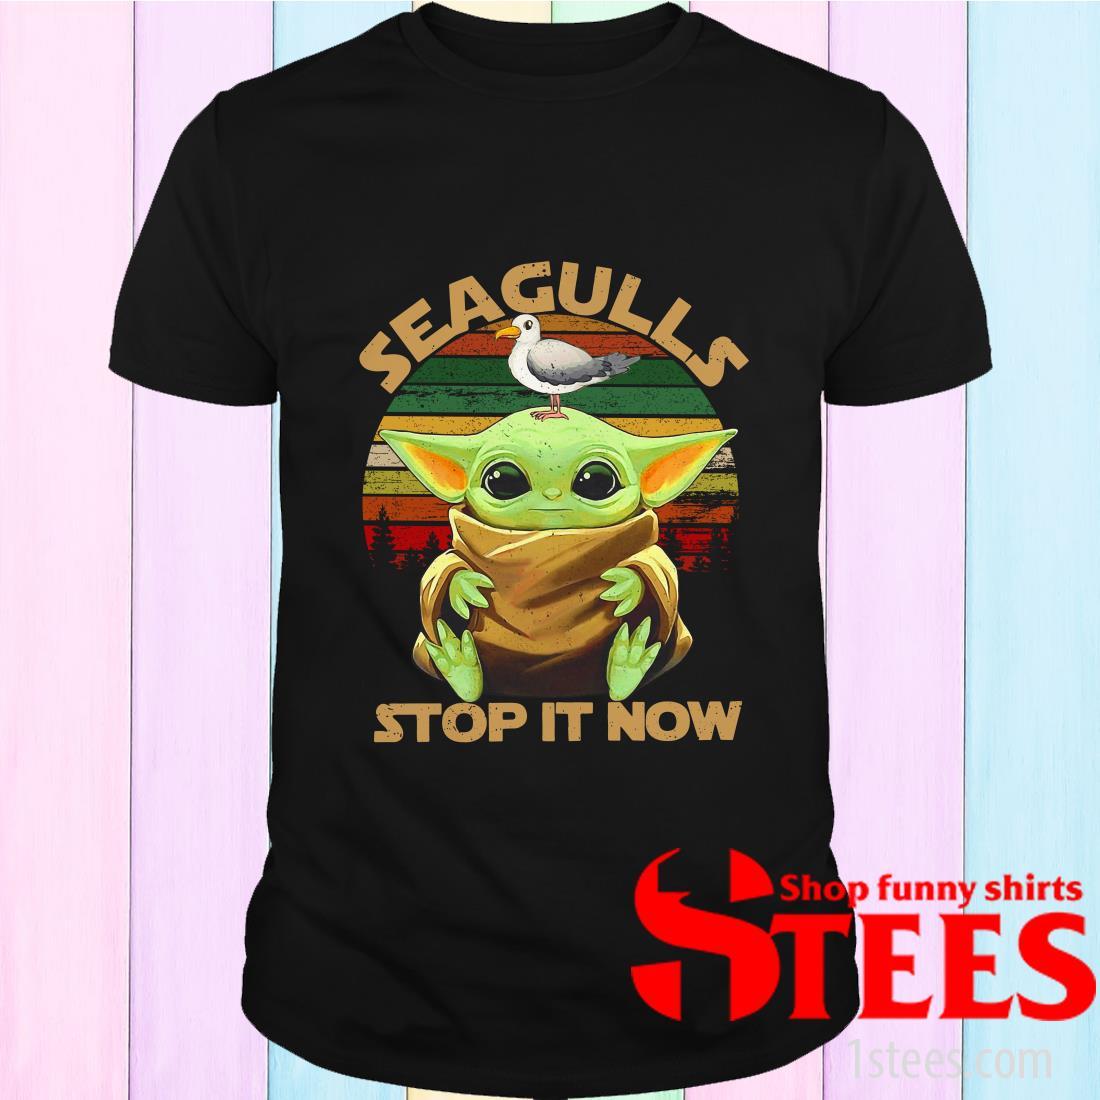 Star Wars Seagulls Baby Yoda Stop It Now T-Shirt